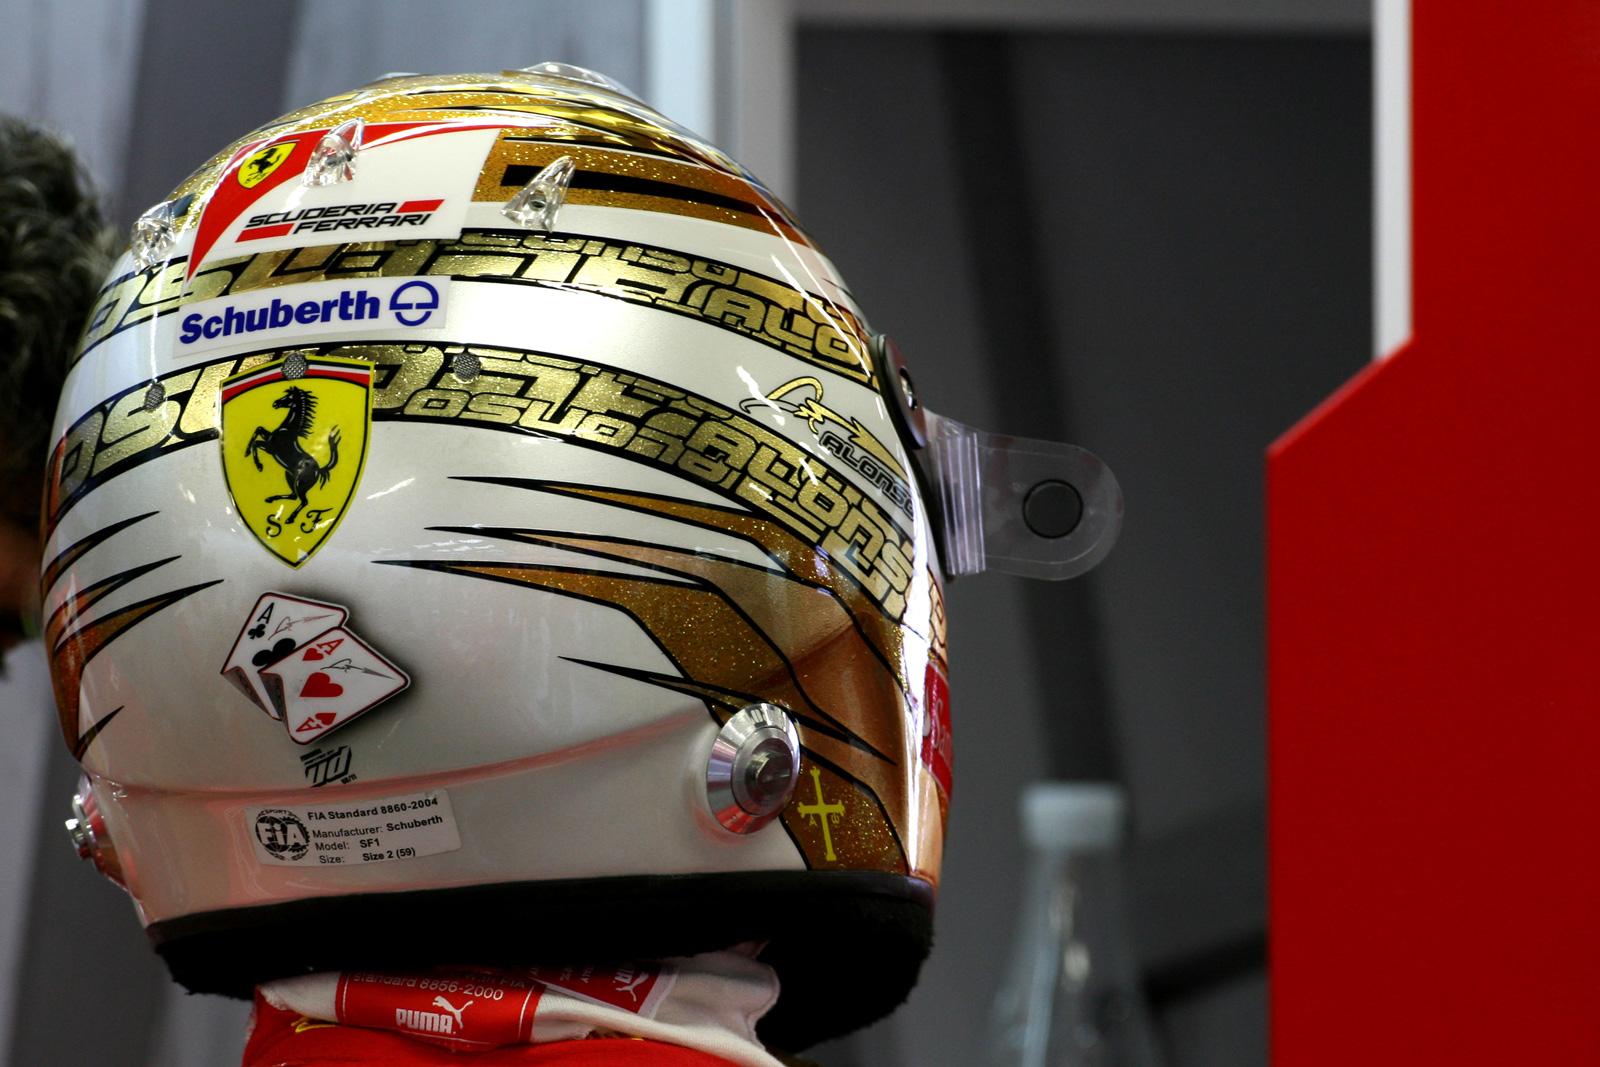 Формула 1 гран при сингапура 2011 гонка 27 фотография